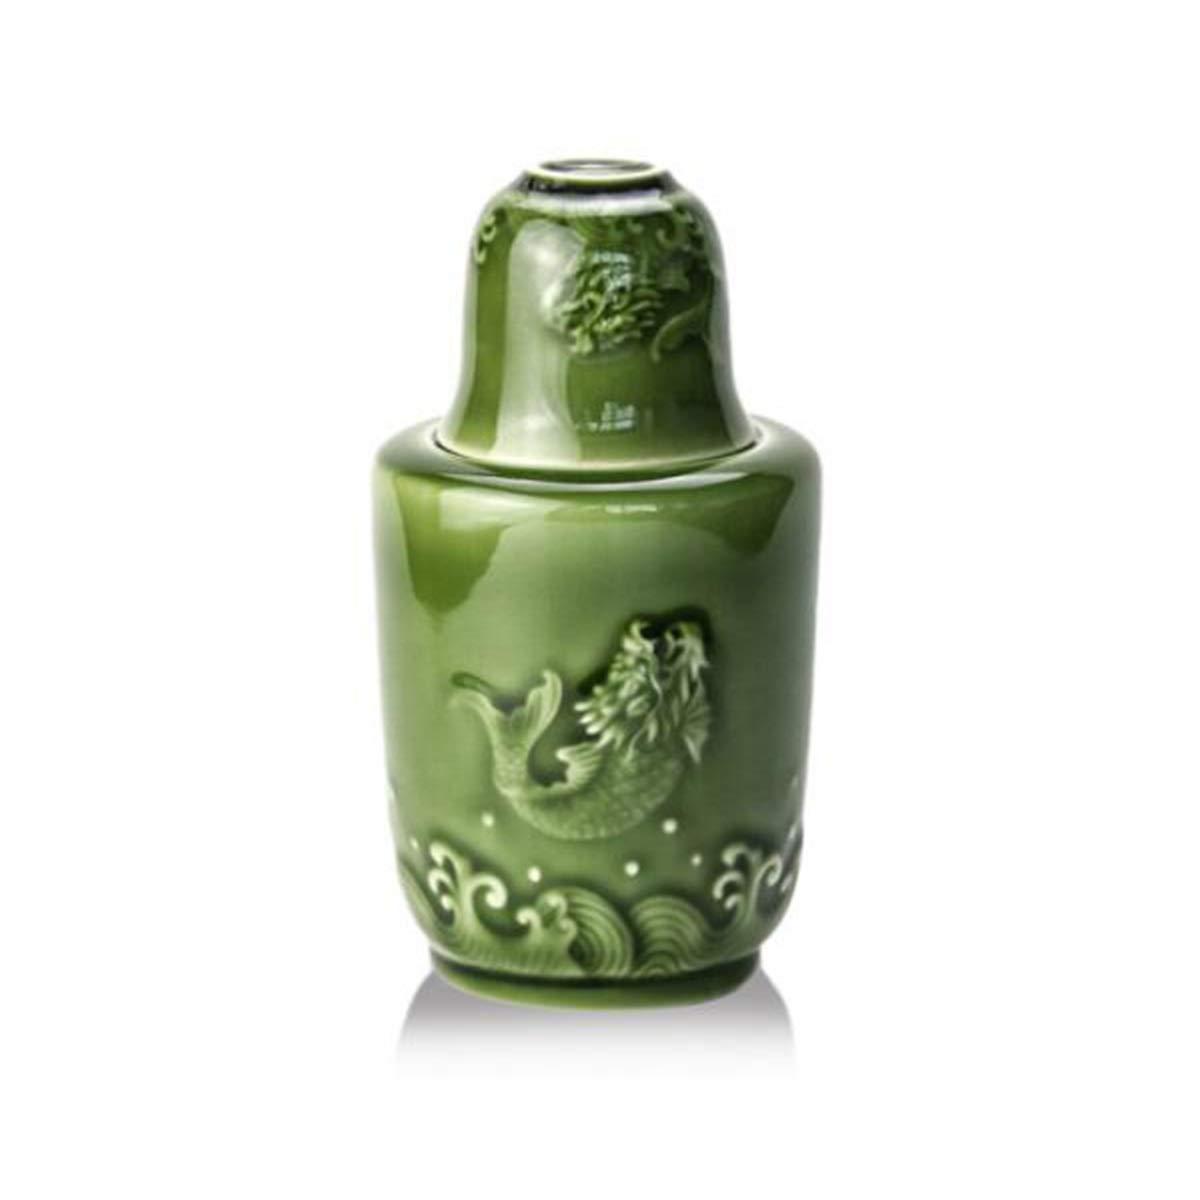 JINSHANDIANLIAO Flagon、ヒップフラスコ、ライブ陶器暖かいワイン製品、魚のジャンプガントリー暖かいワインスリーピースセット白ワインクーラー暖かいワインポット、青、緑 水差し (Capacity : 90ml, Color : Green) 90ml Green B07TQSZL2D